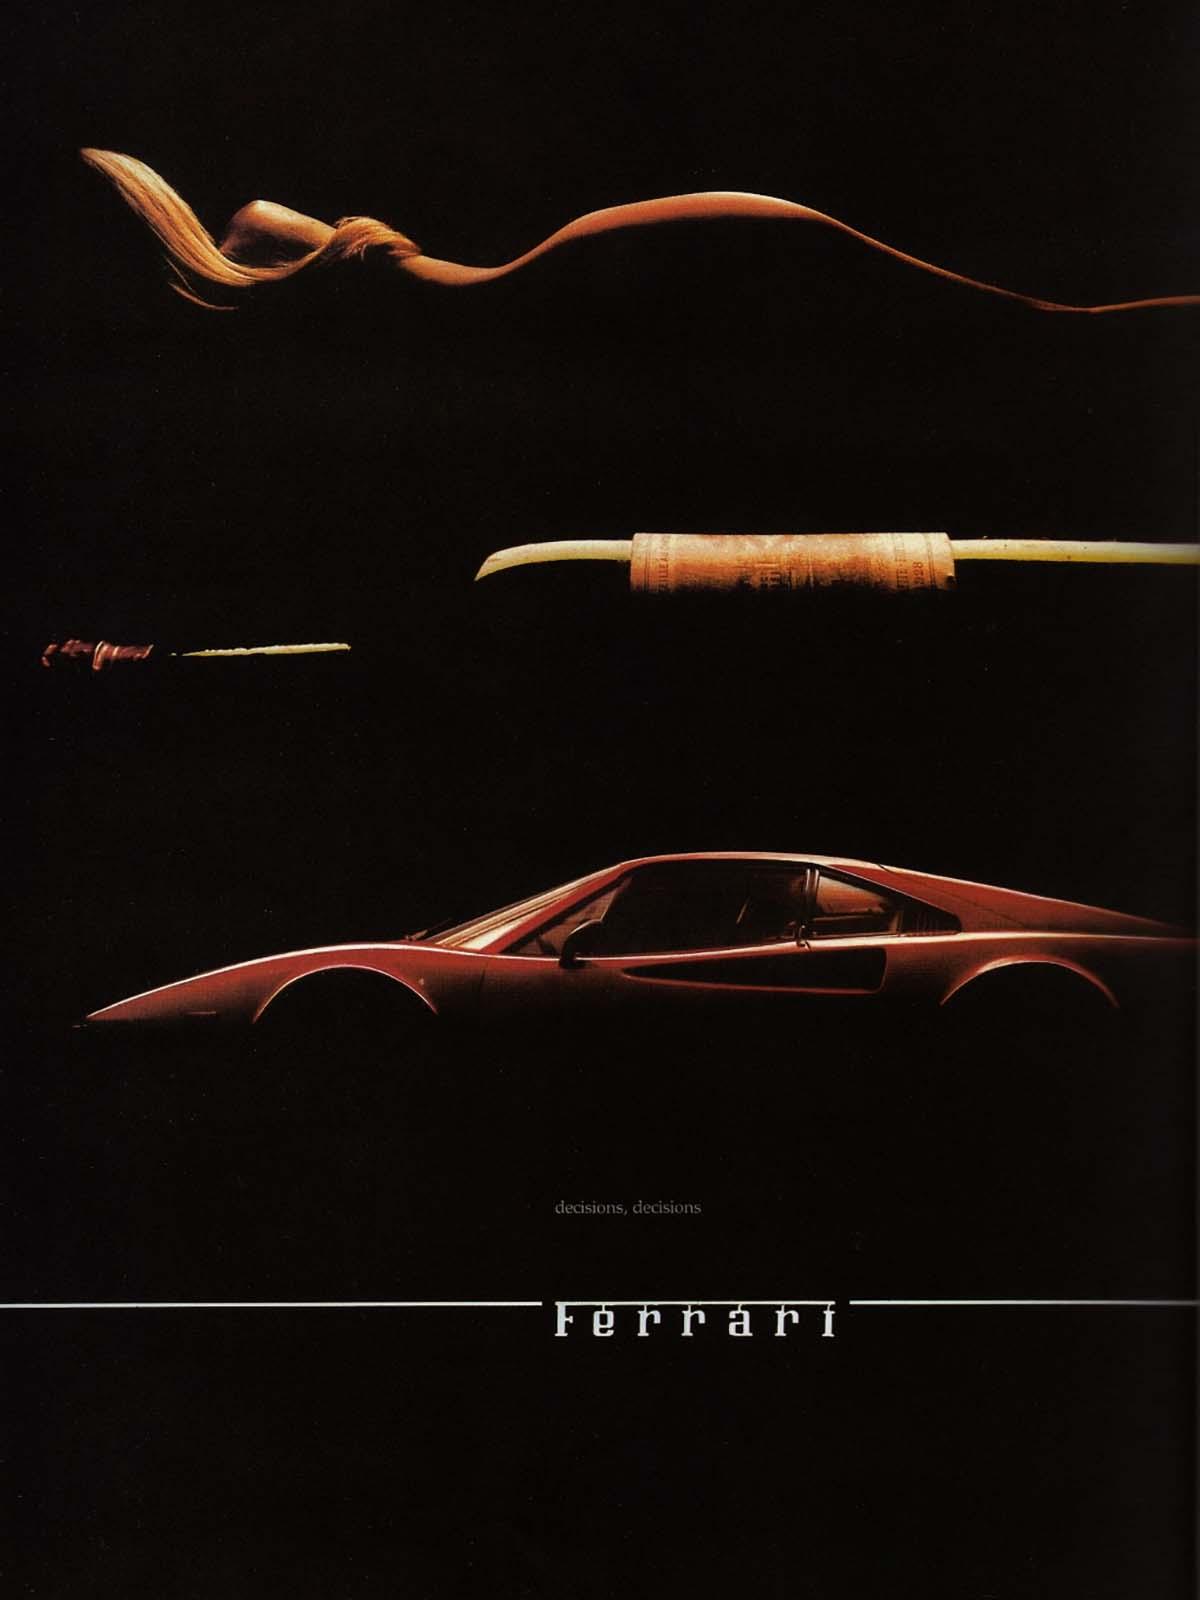 Ferrari decisions decisions